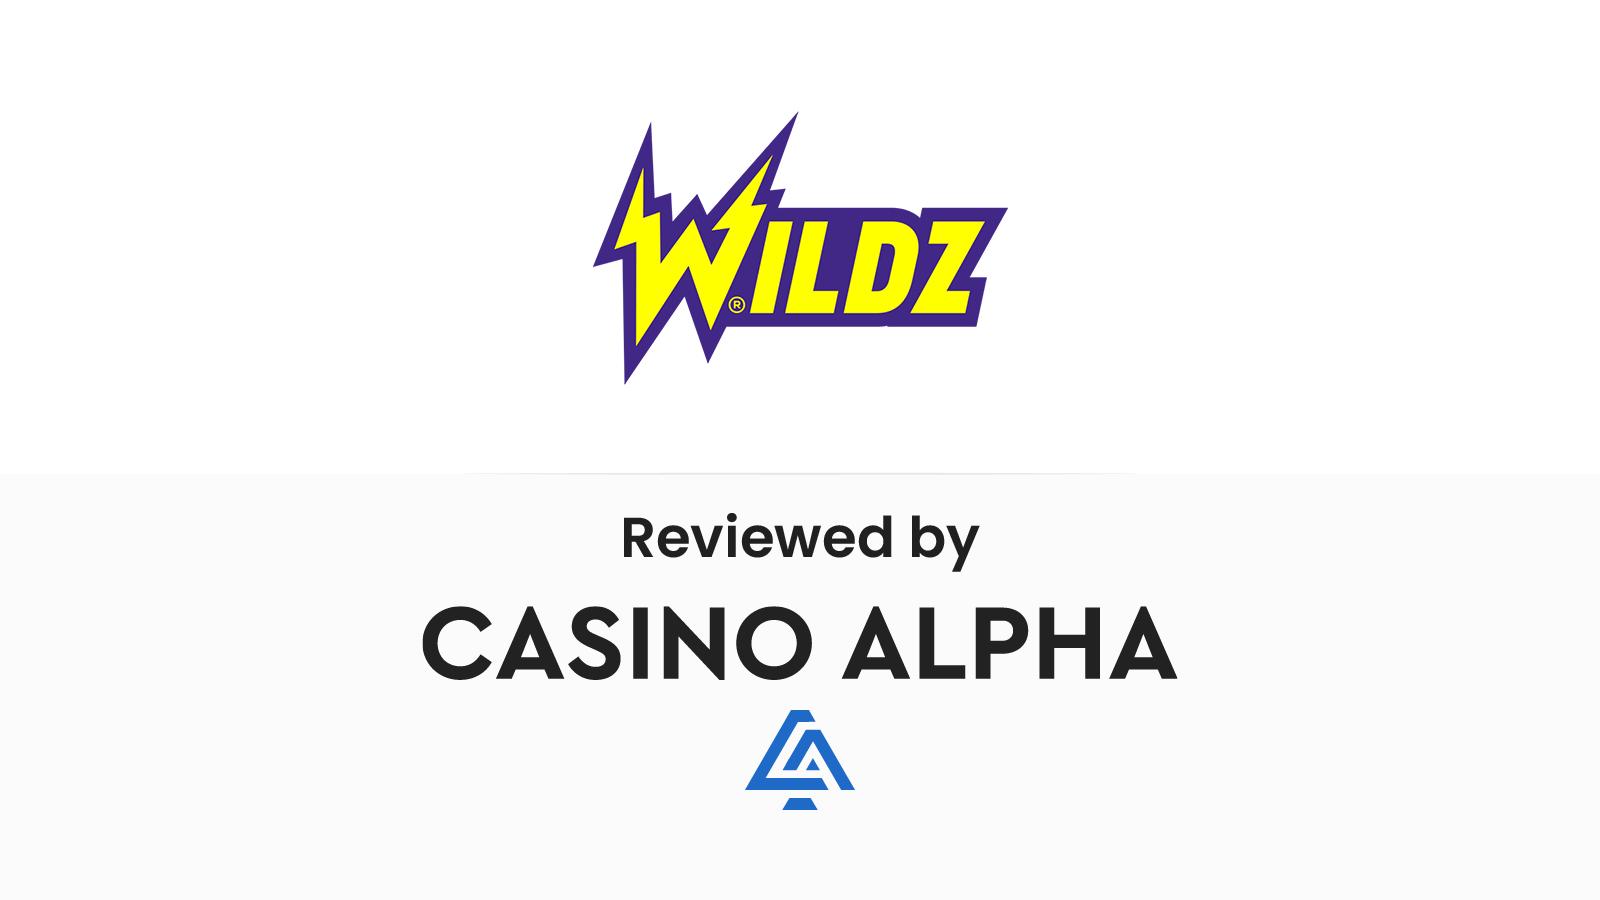 Wildz Review & Bonuses